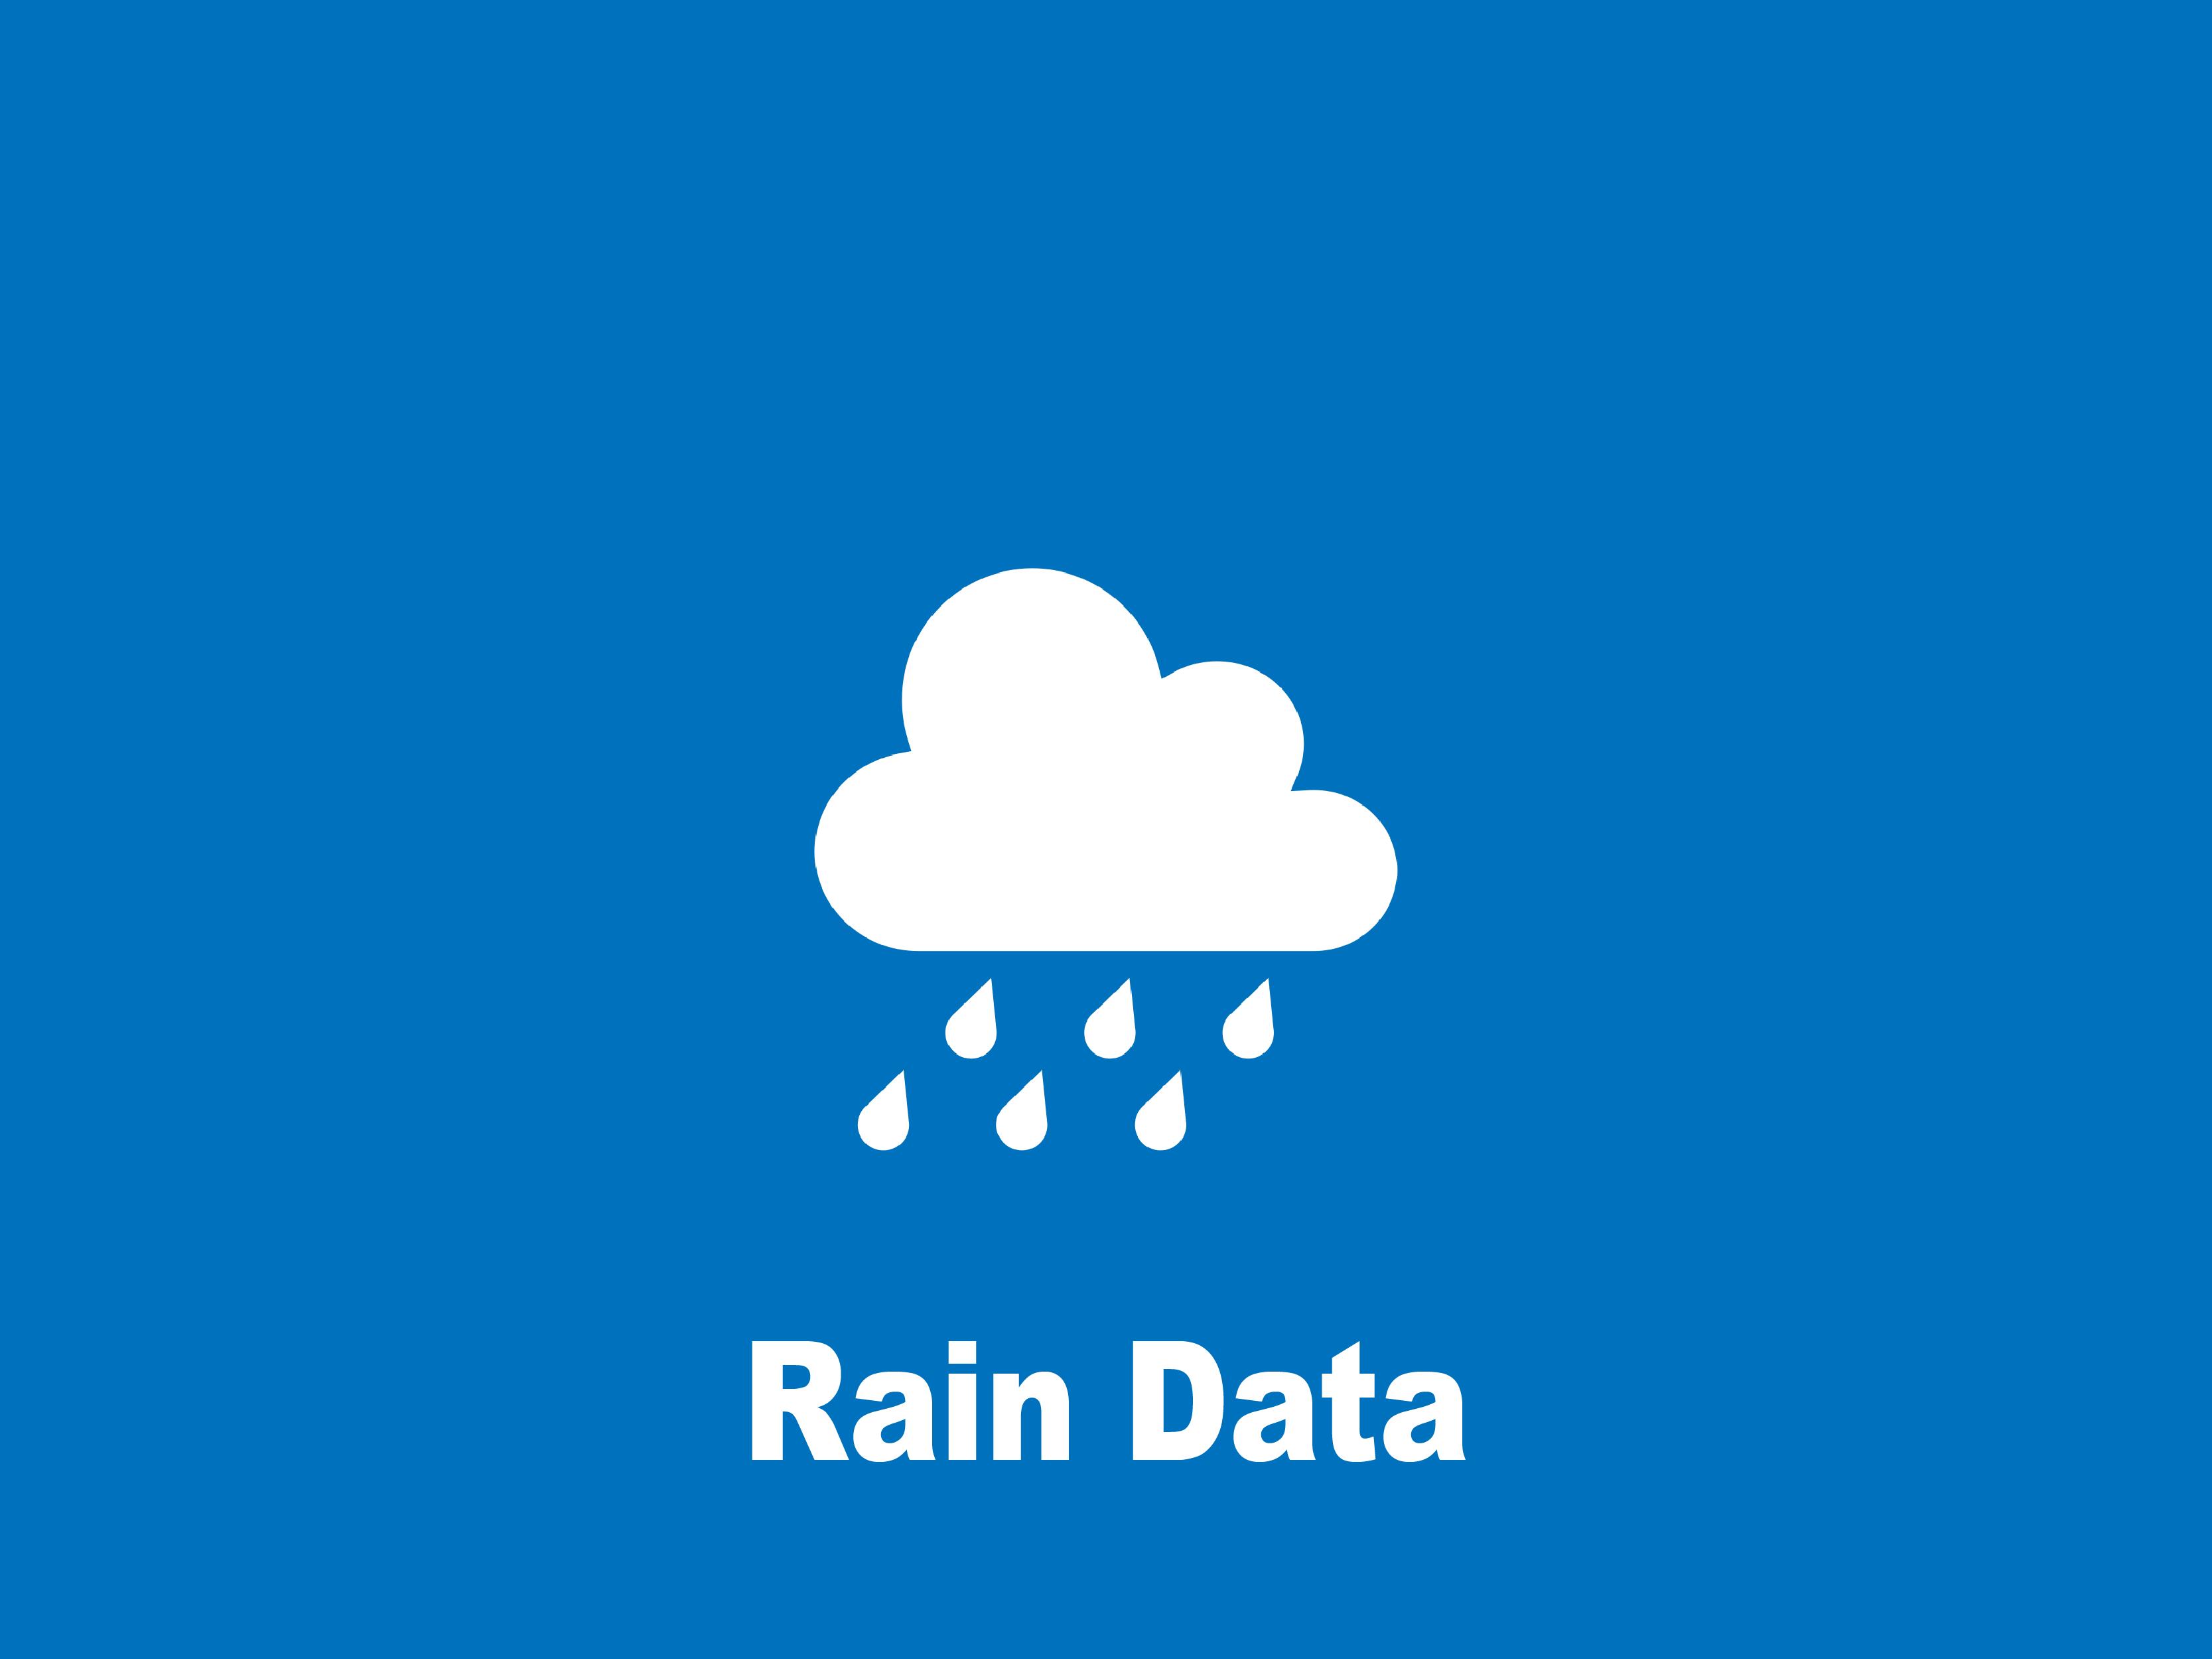 Rain Data Icon